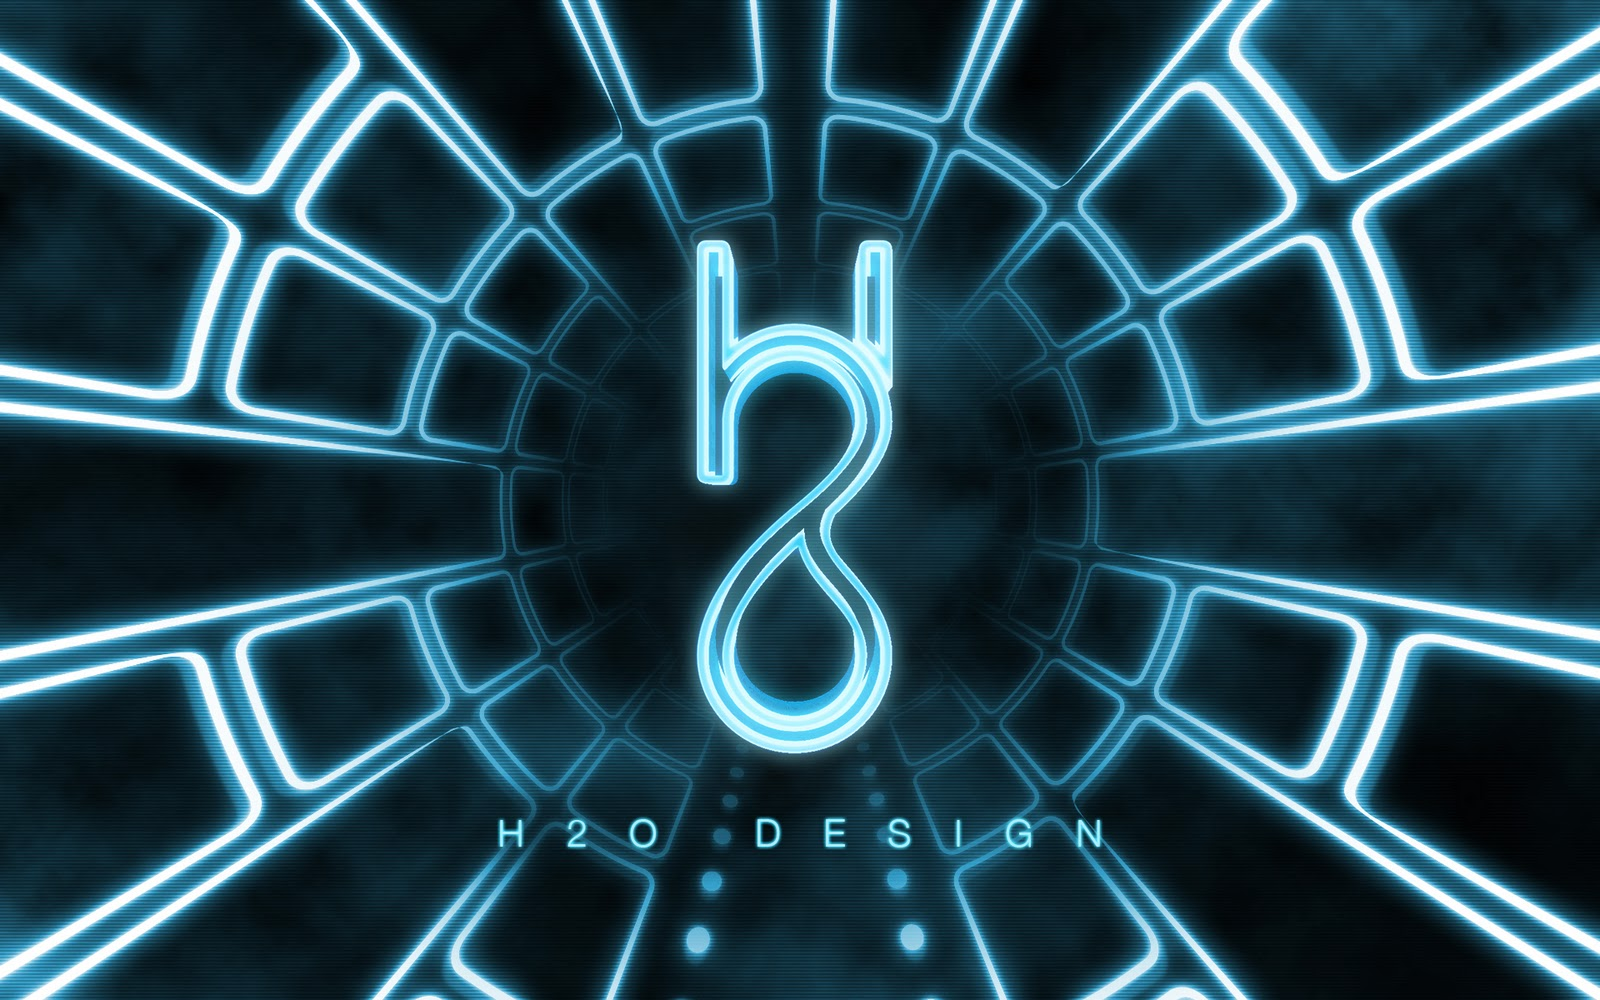 http://3.bp.blogspot.com/_6TN_3aK-nr4/TRBS8t8rTlI/AAAAAAAAAMI/-OALNLmkDK8/s1600/H2O+Tron+Style.jpg